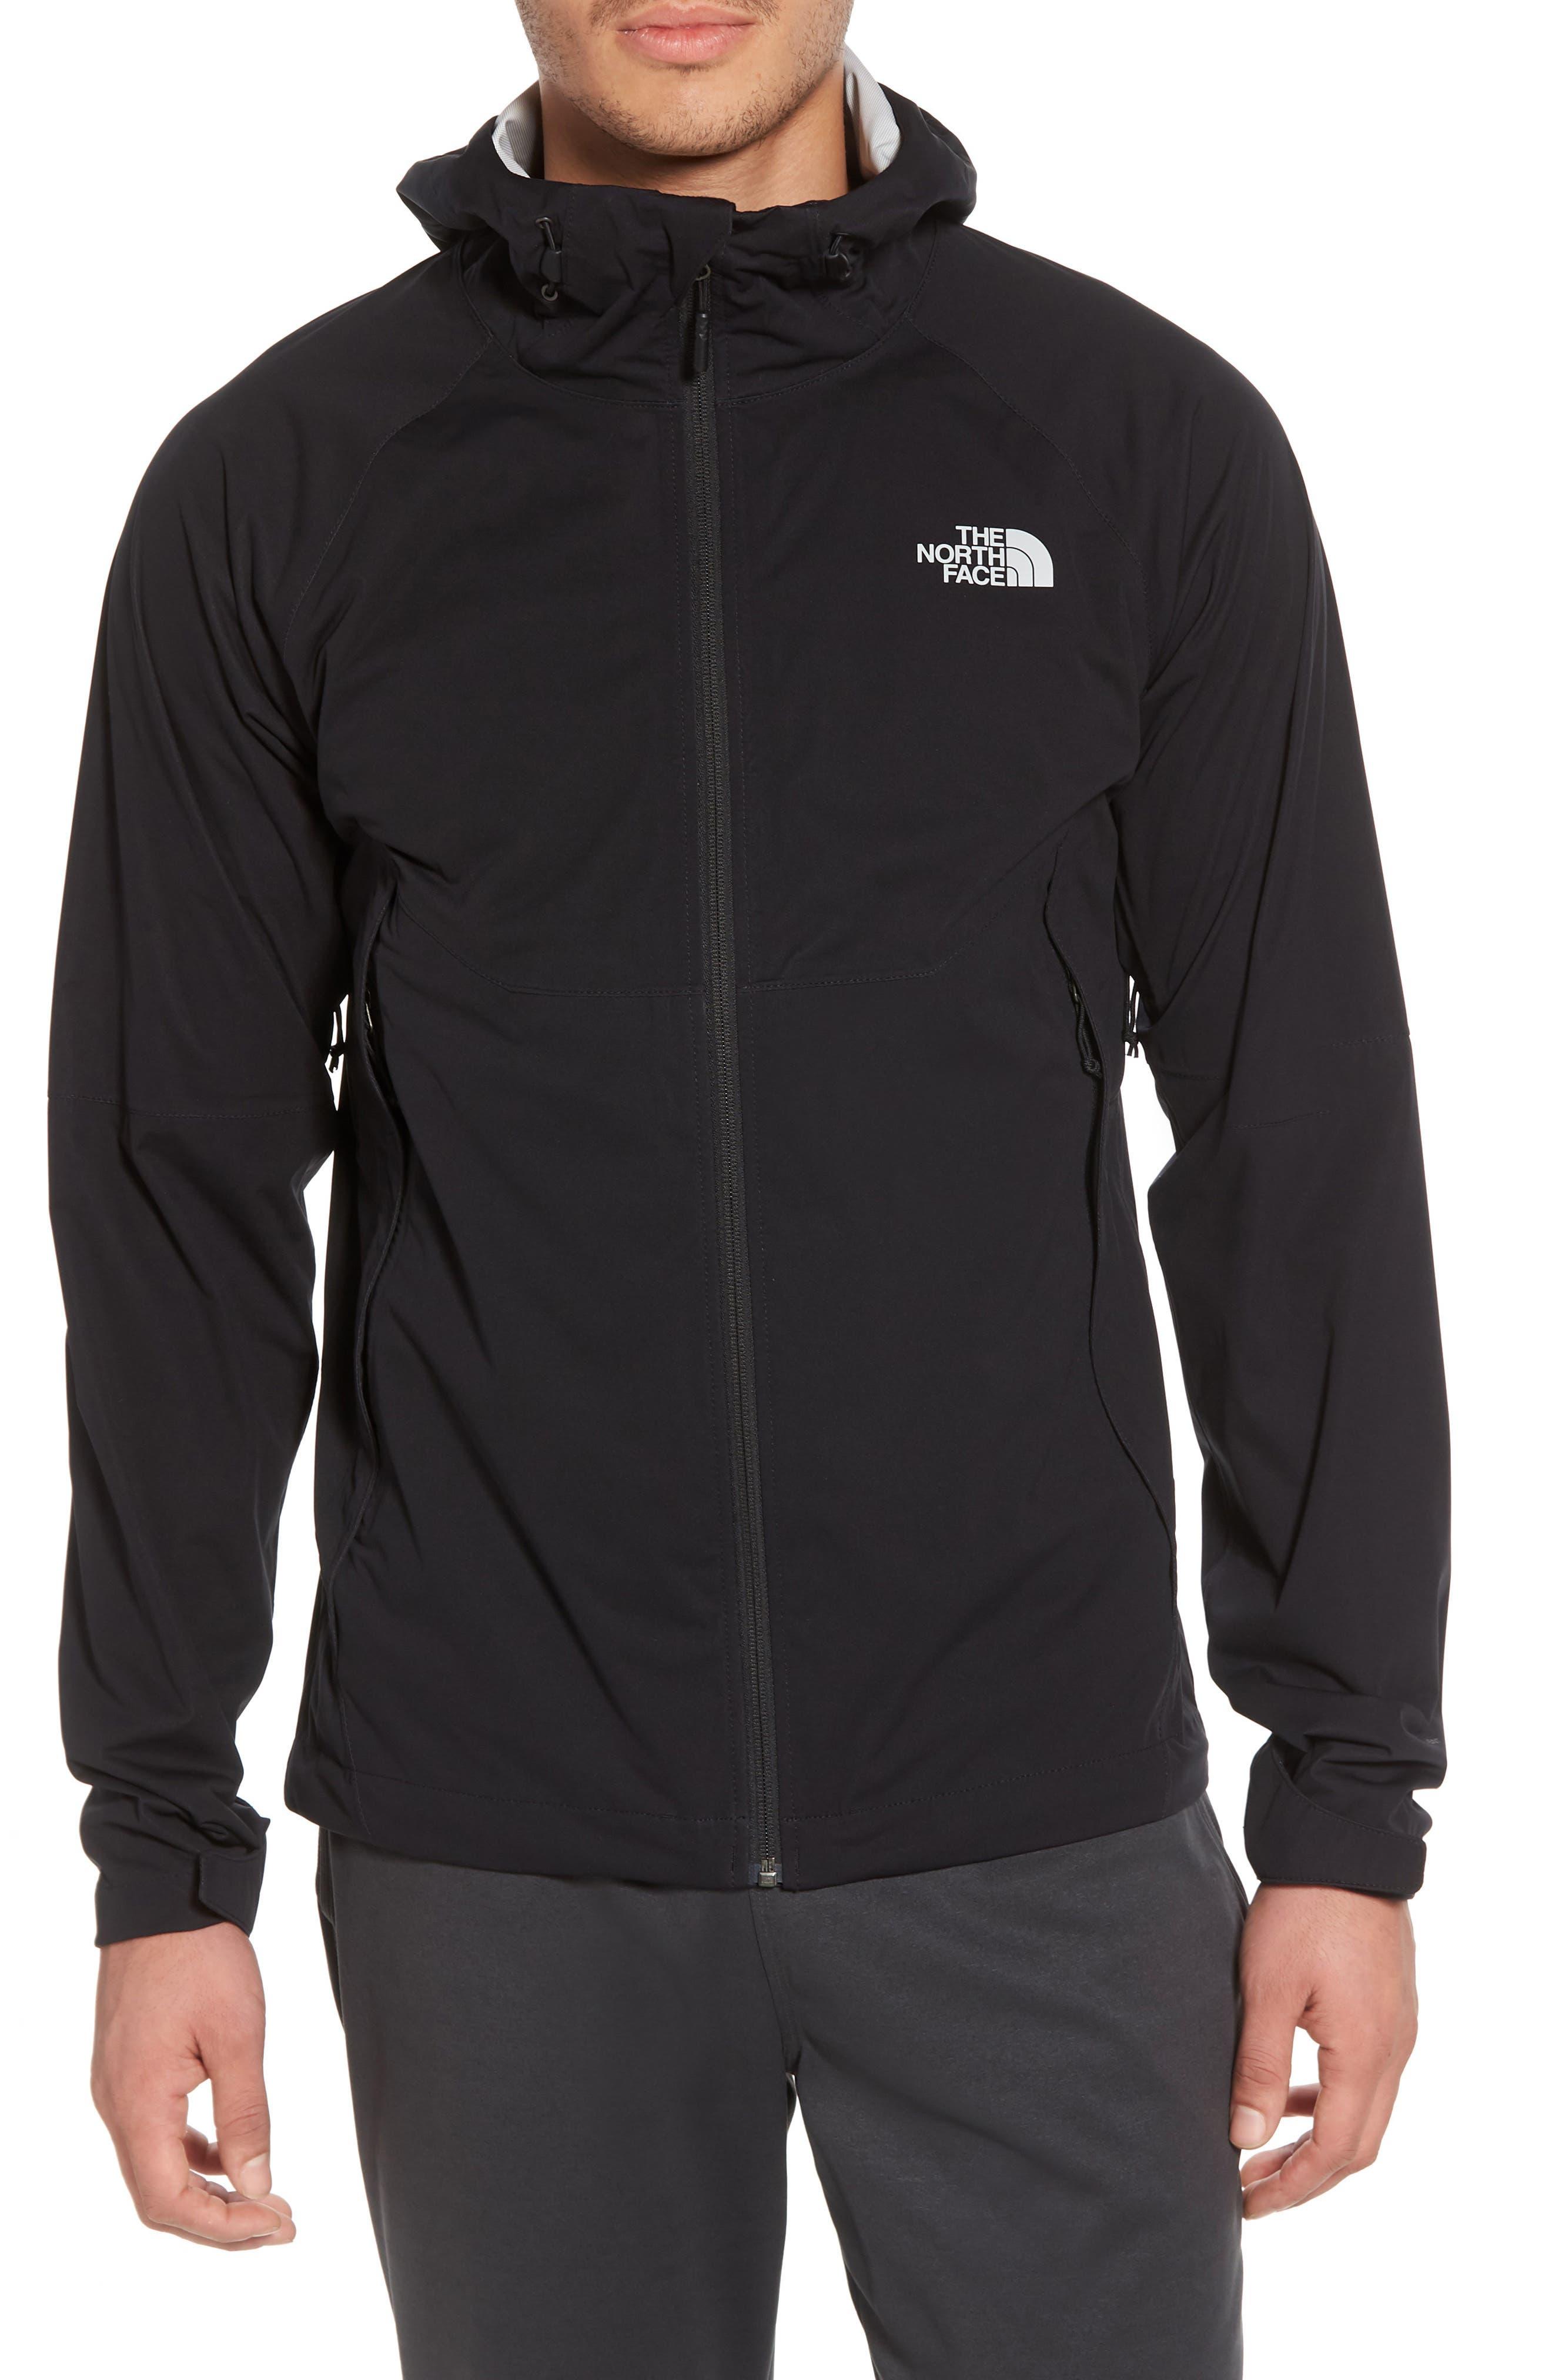 Allproof Stretch Hooded Rain Jacket,                             Alternate thumbnail 4, color,                             TNF BLACK